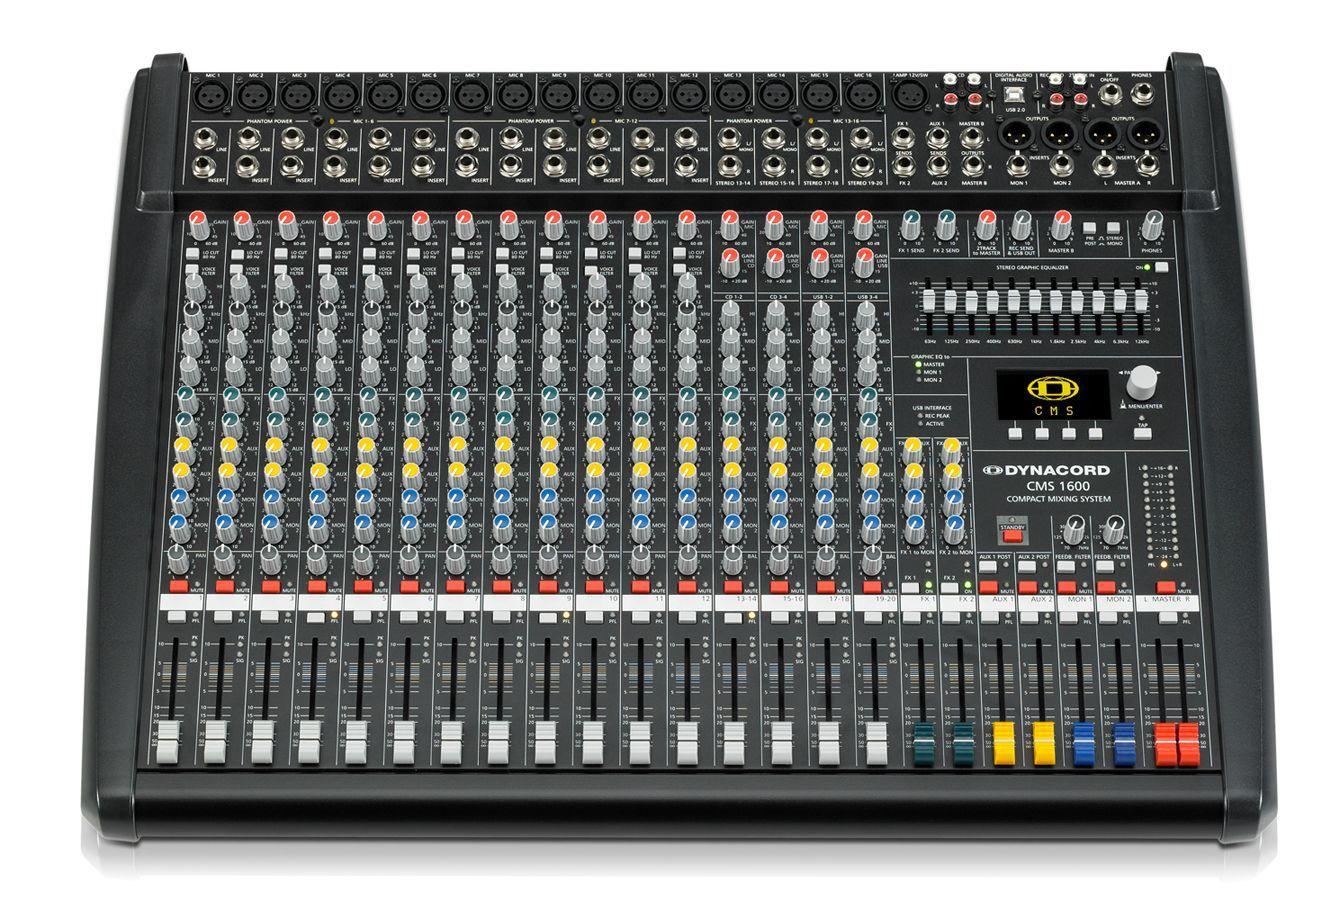 Dynacord CMS 1600-3 Mixer, Mischpult, 12 Mikrofoneingänge, 4 Stereokanäle, EQ